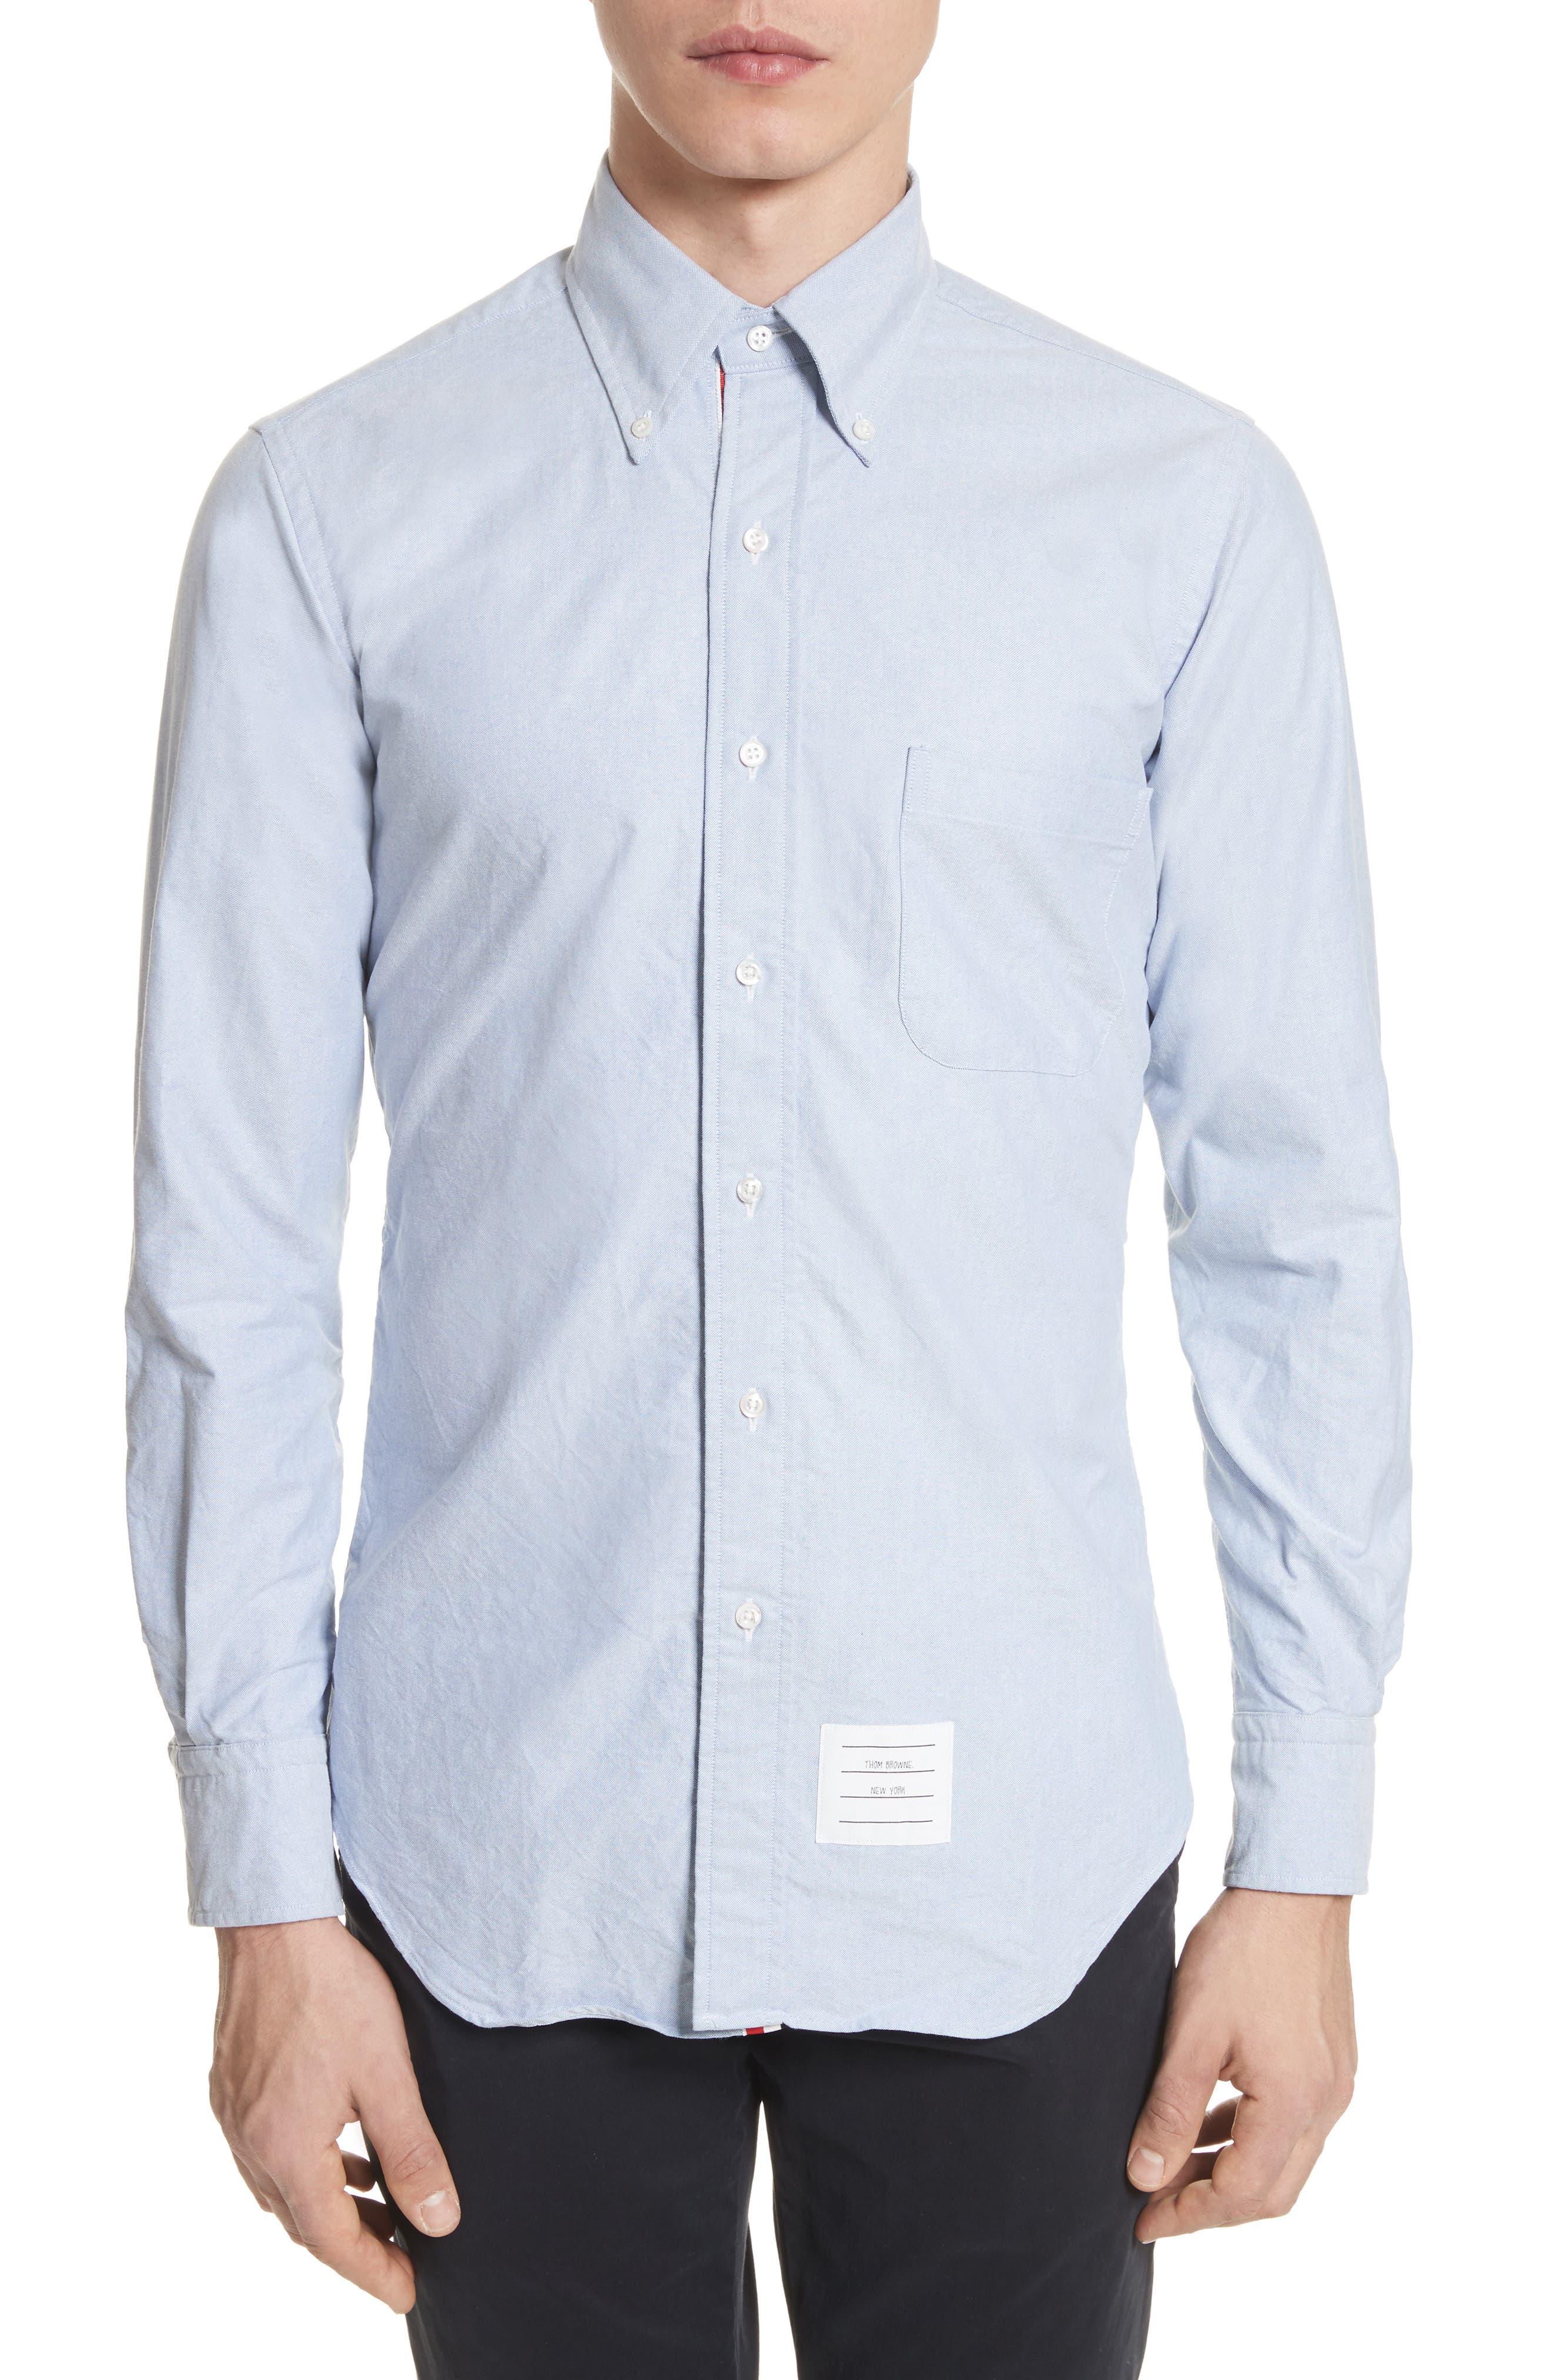 Extra Trim Fit Oxford Shirt with Grosgrain Trim,                             Main thumbnail 1, color,                             LIGHT BLUE